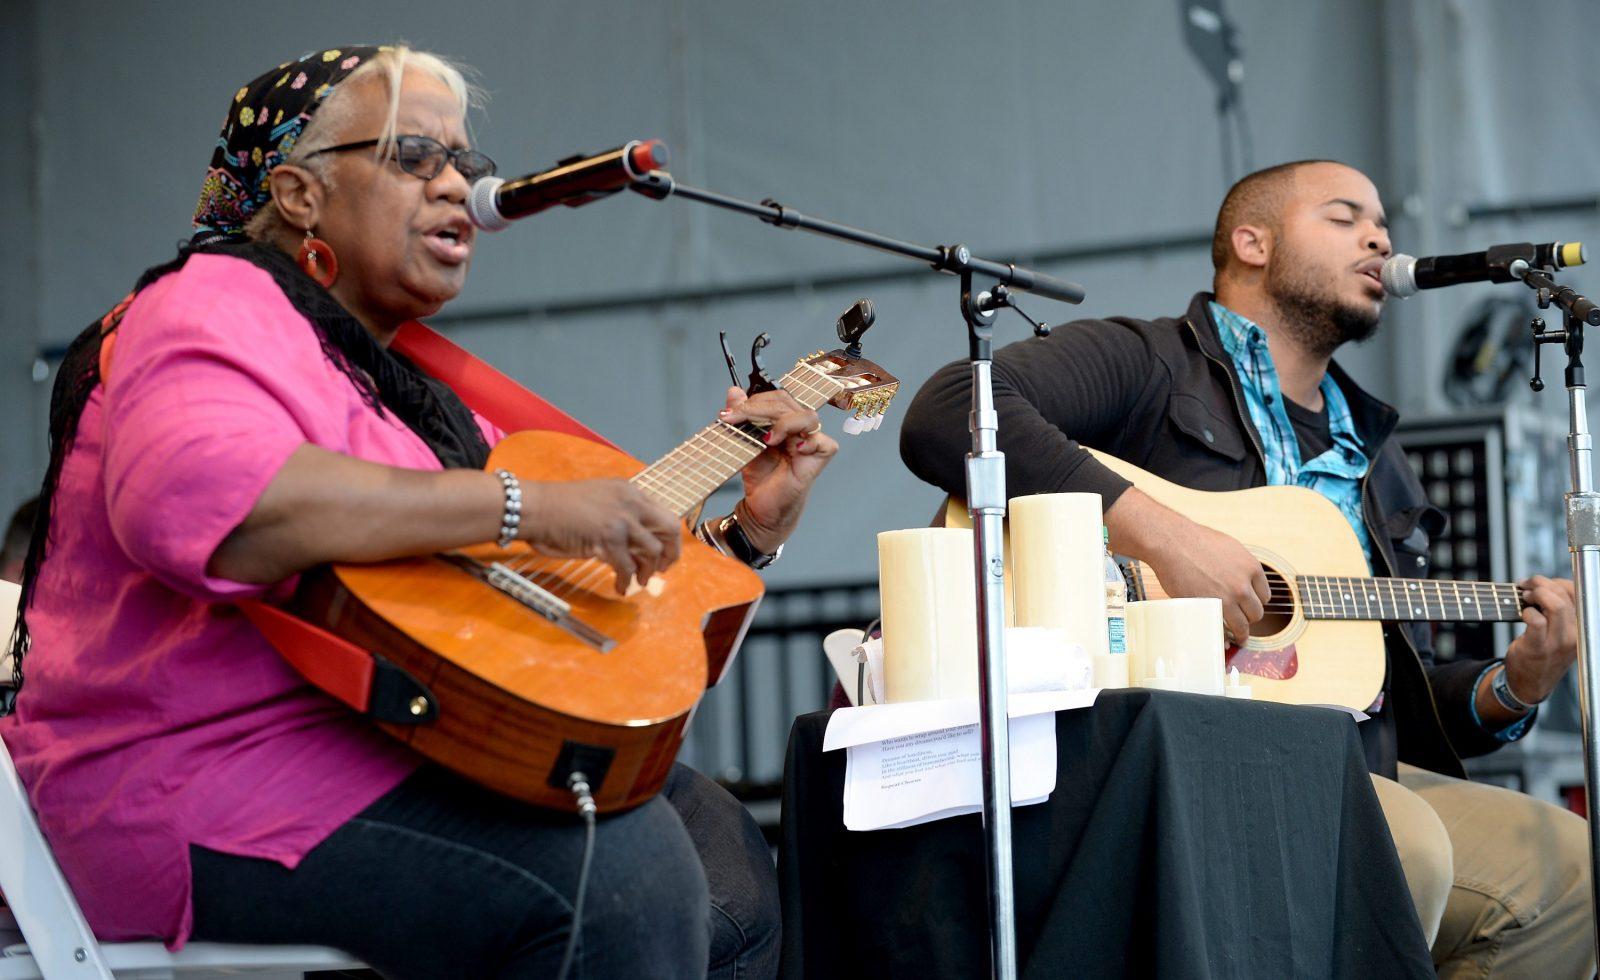 Ruth Ward and Madisen Ward of Madisen Ward and the Mama Bear will perform at Kerfuffle on July 23 at Canalside. (Getty Images)